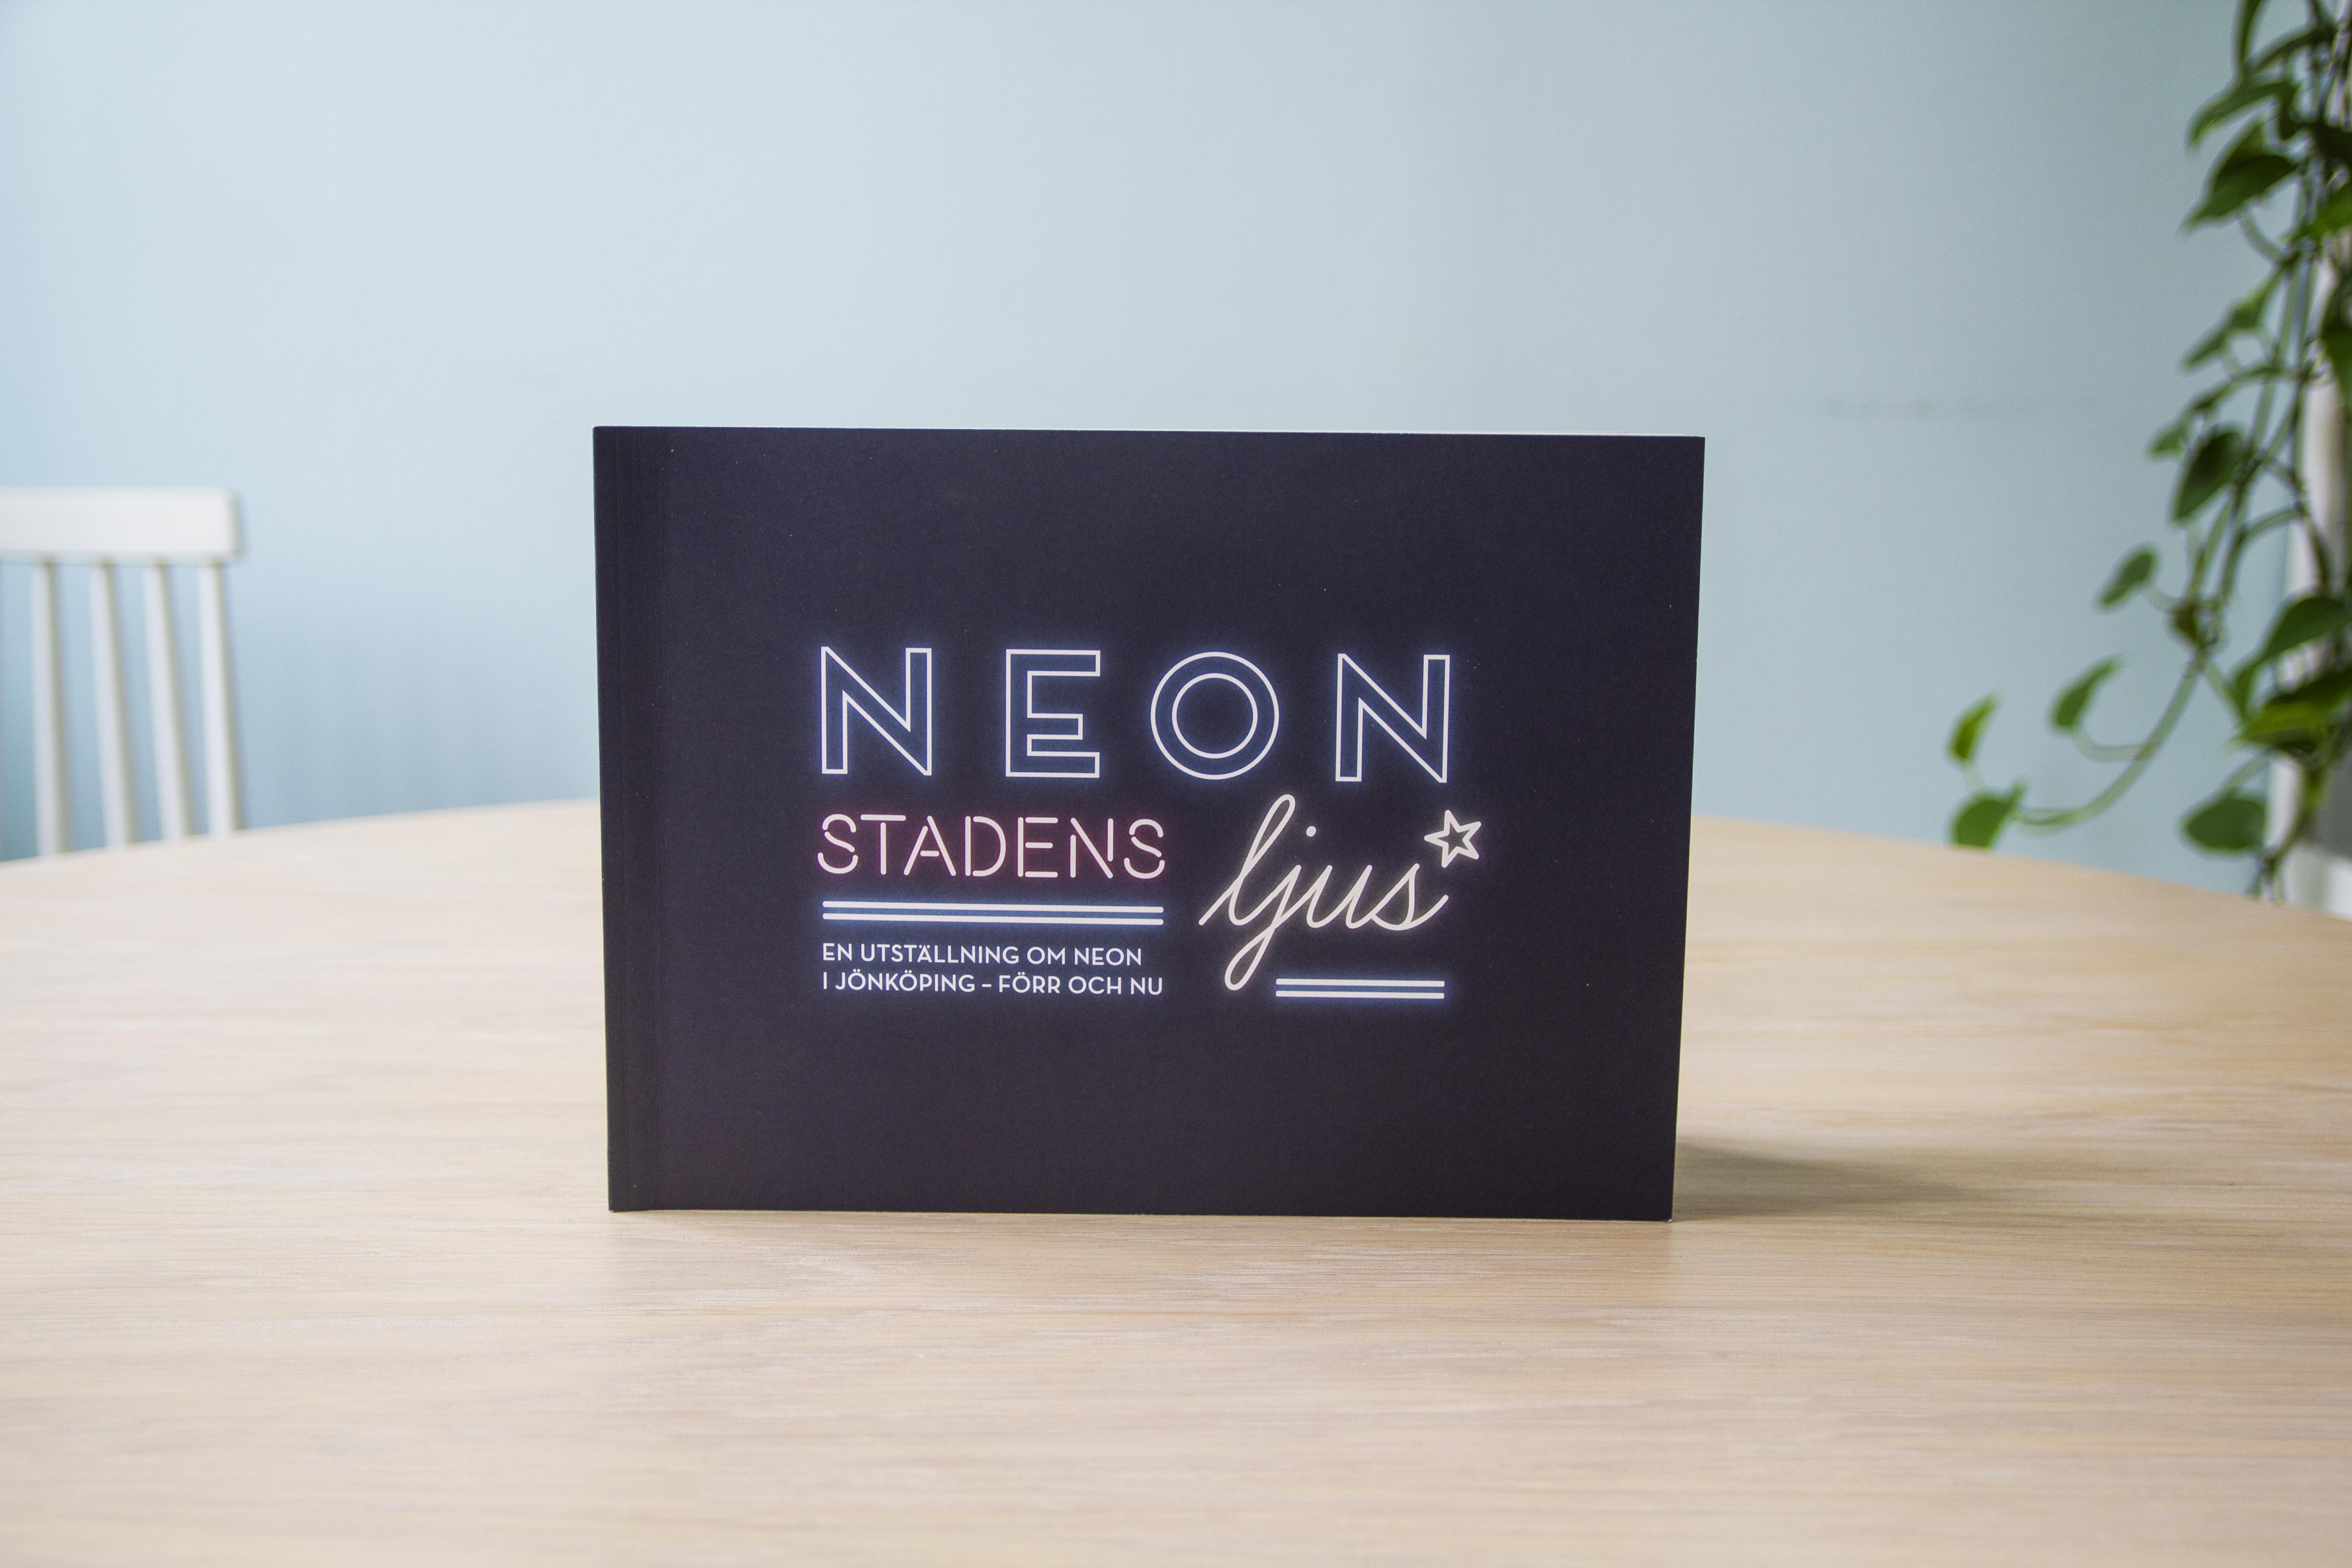 Neon_foto